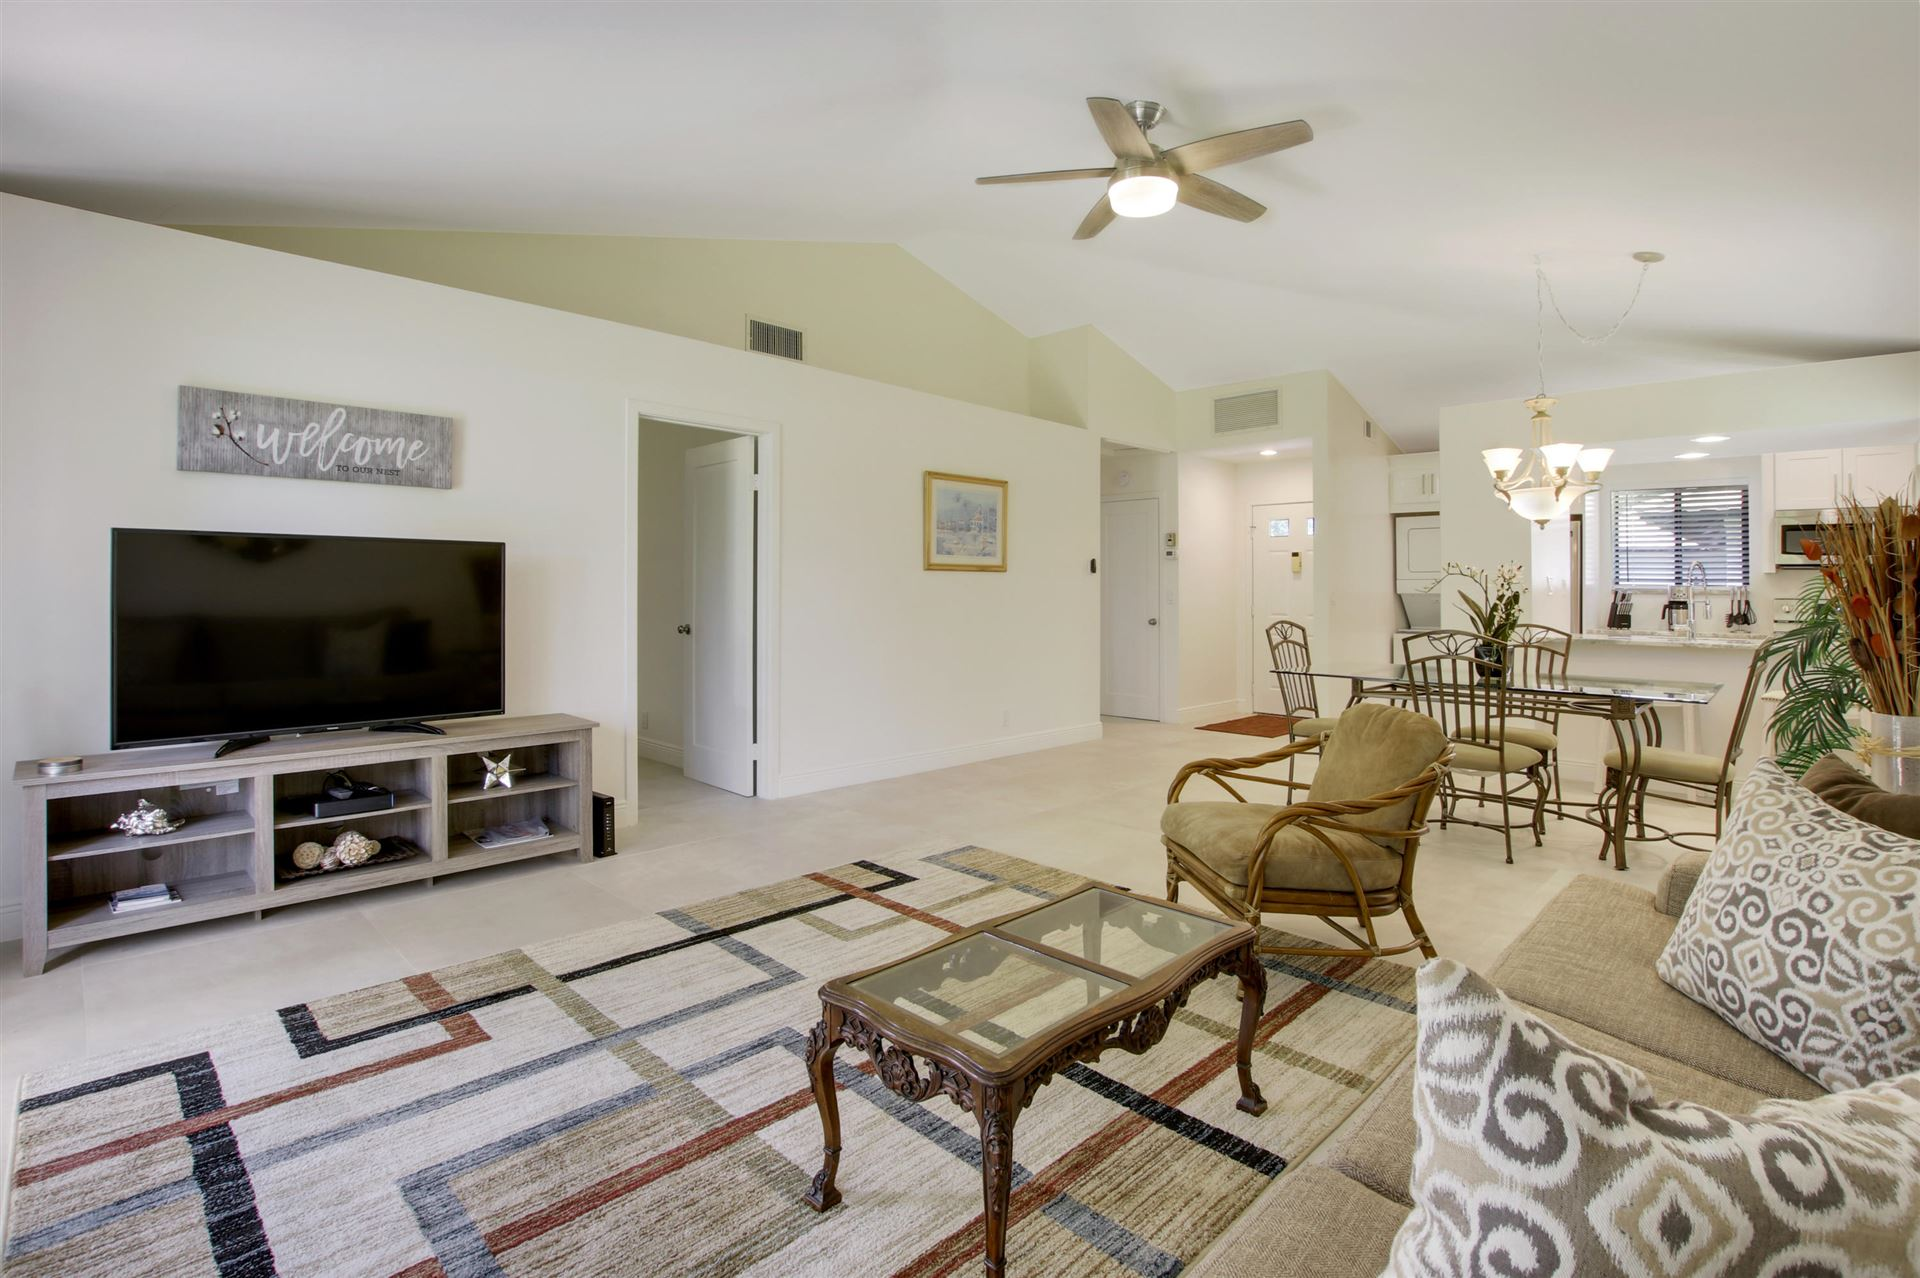 Photo of 826 Club Drive #826, Palm Beach Gardens, FL 33418 (MLS # RX-10632248)